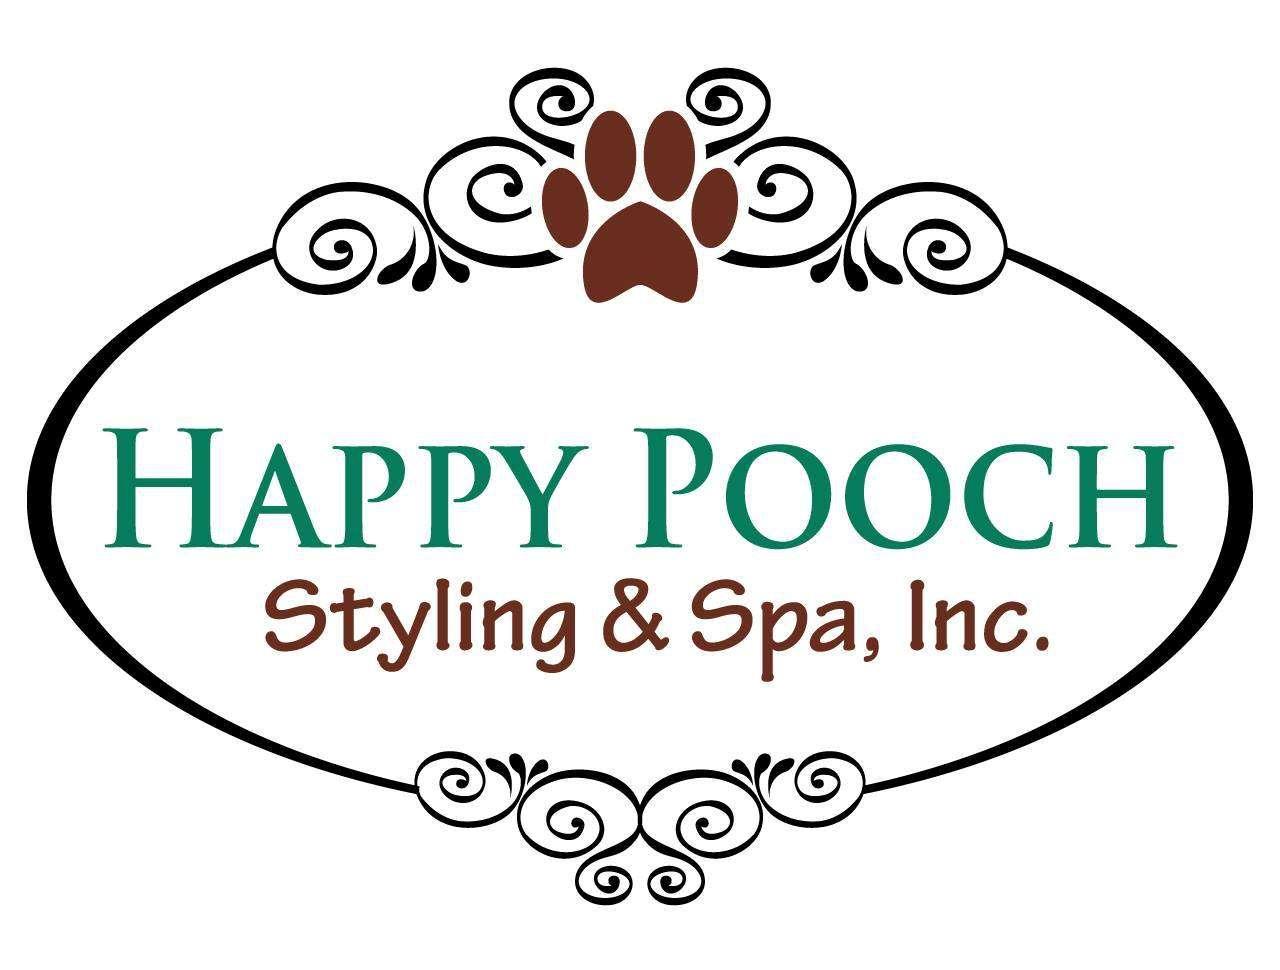 Happy Pooch Styling & Spa, Inc